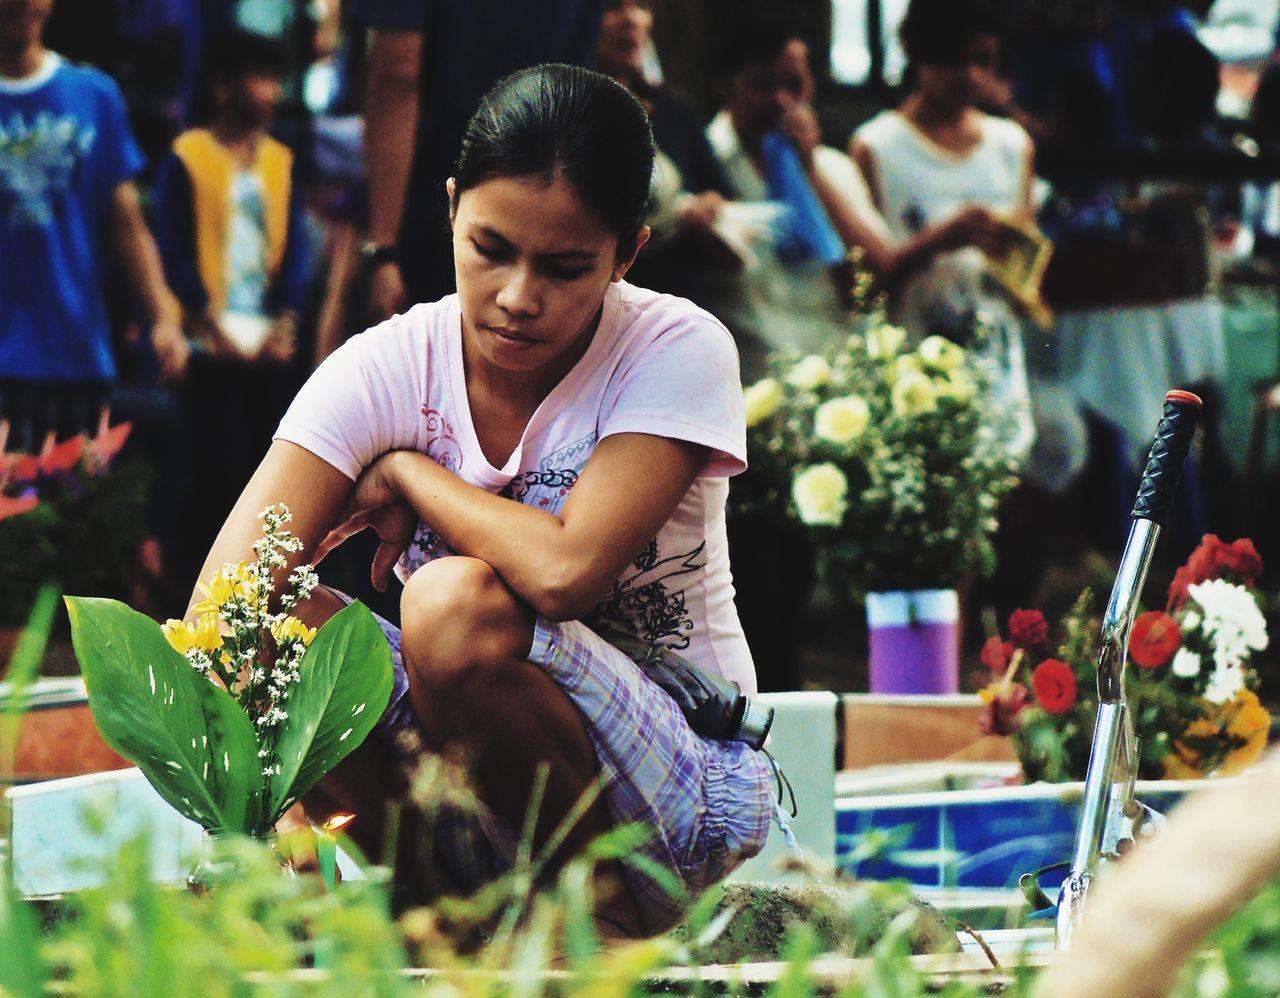 Missing badly Global EyeEm Adventure - Philippines AllSaintsDay The Photojournalist - 2015 EyeEm Awards